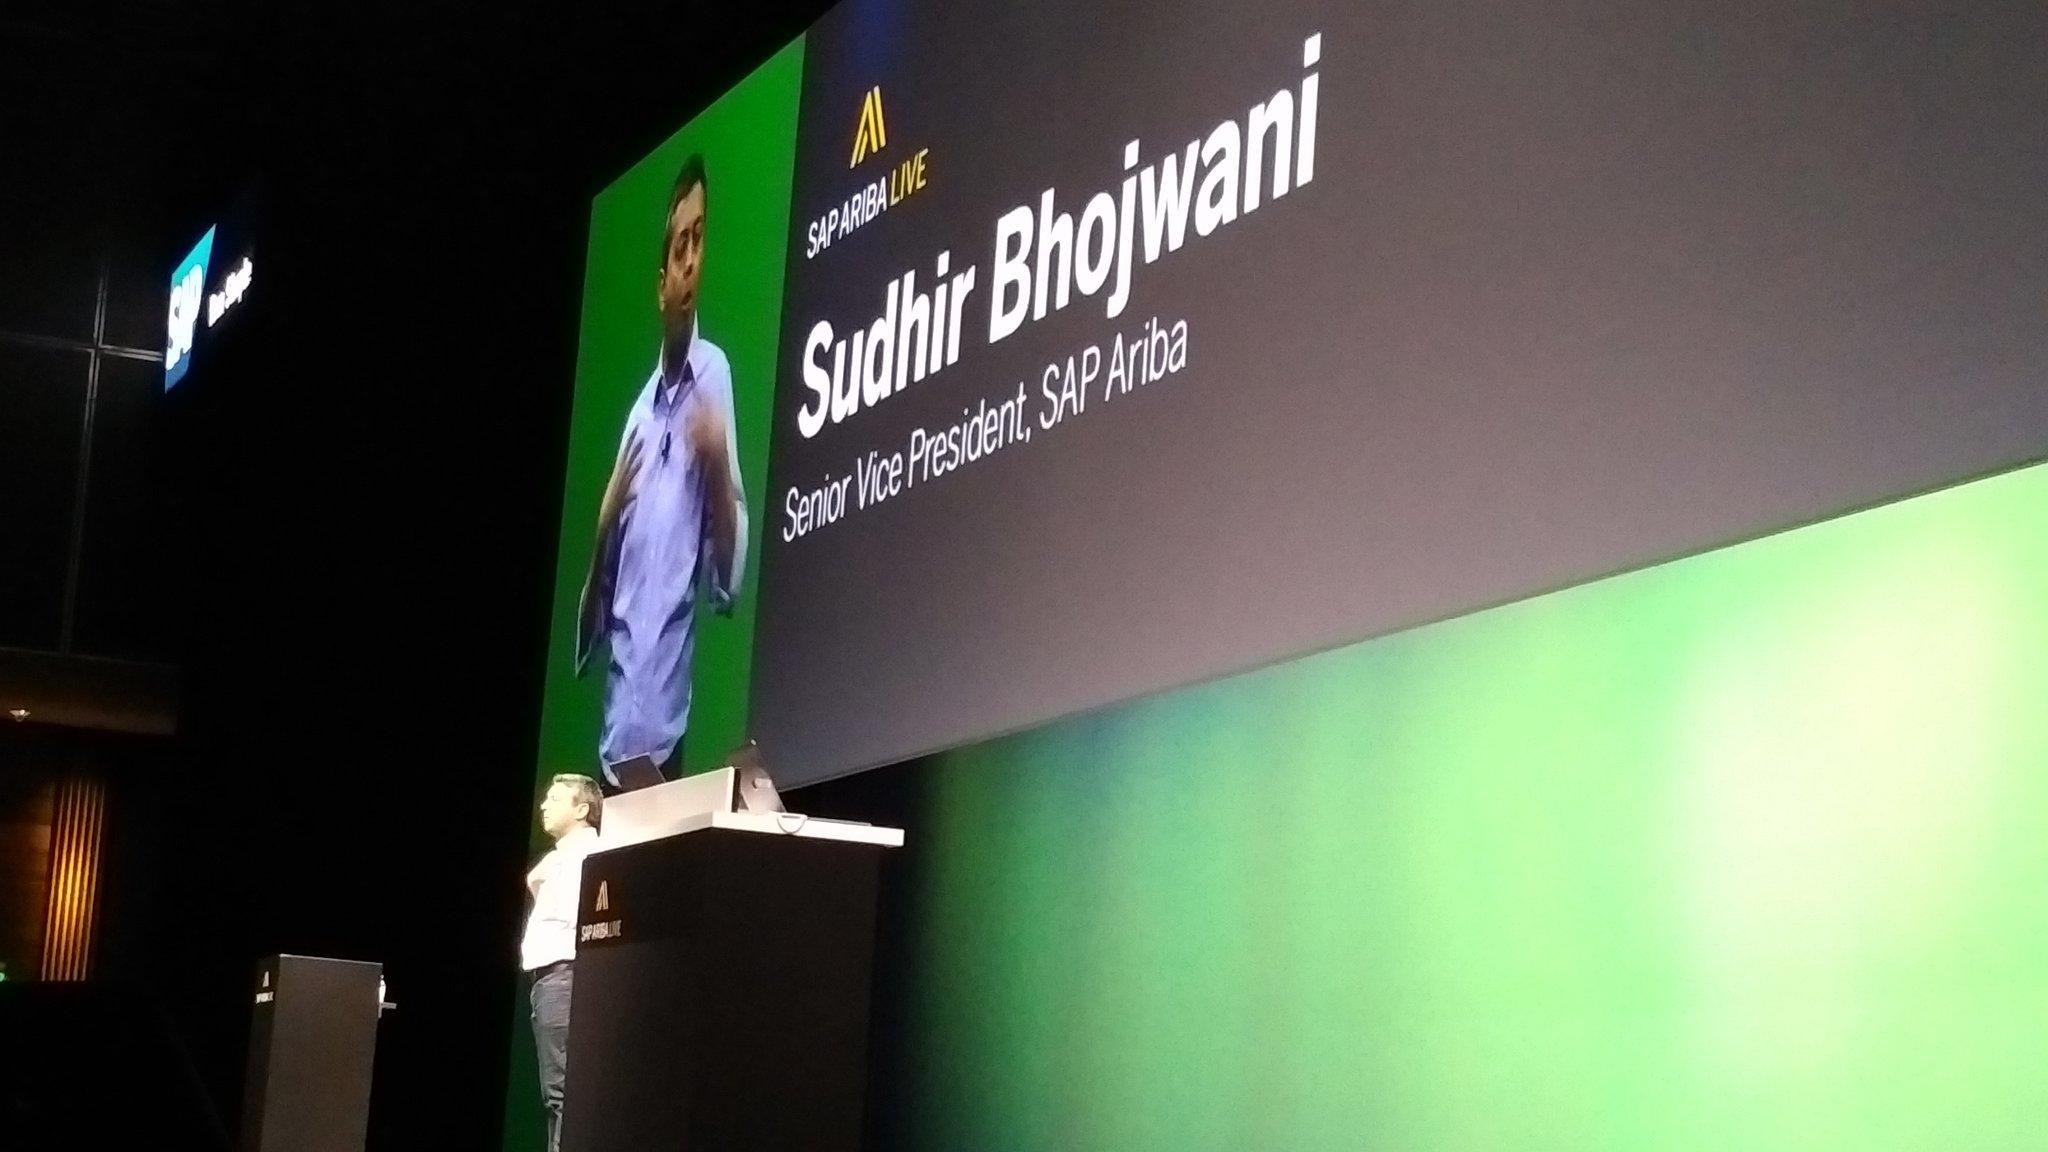 Next up -  Bhojwani on the @SAPAriba Apps #SAPARIBALIVE https://t.co/28r04Nwp50